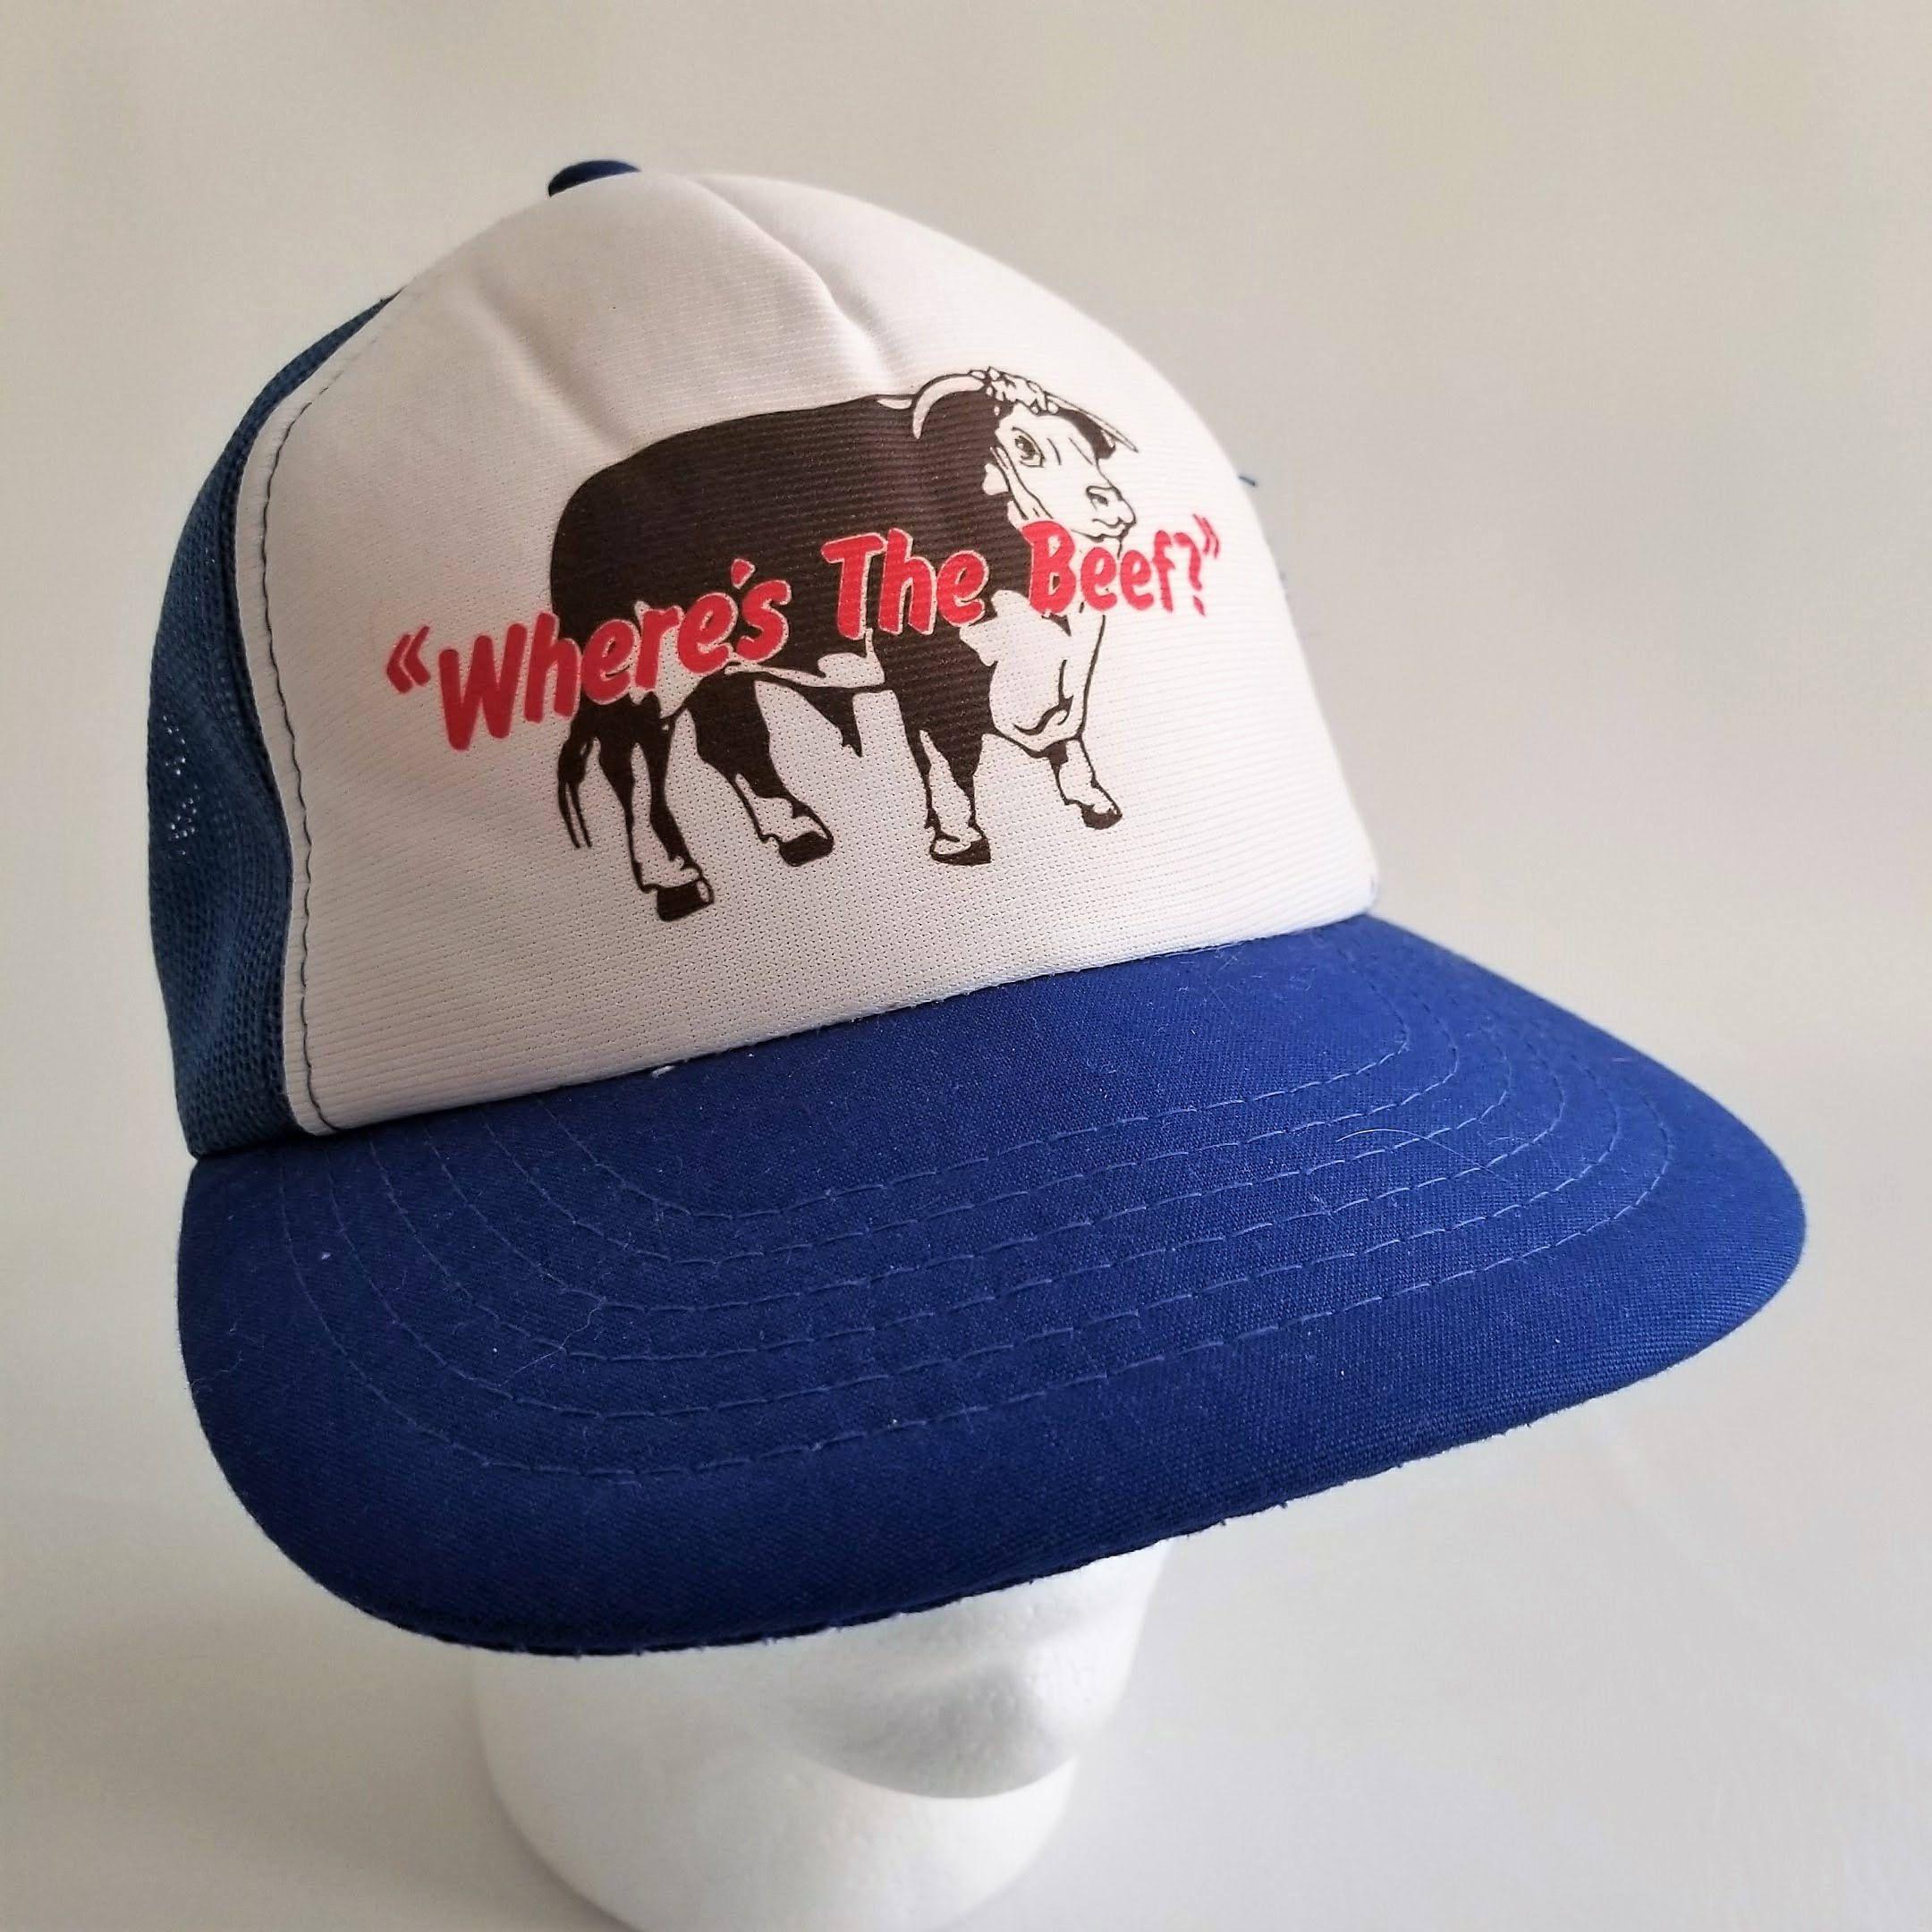 c3c6ca057f7 Vintage 80s Wheres the Beef Cow Funny Snapback Trucker Hat Blue Cap Mesh  Foam Farmer by TraSheeWomen on Etsy  vintage  80s  humor  funny  truckerhat  ...